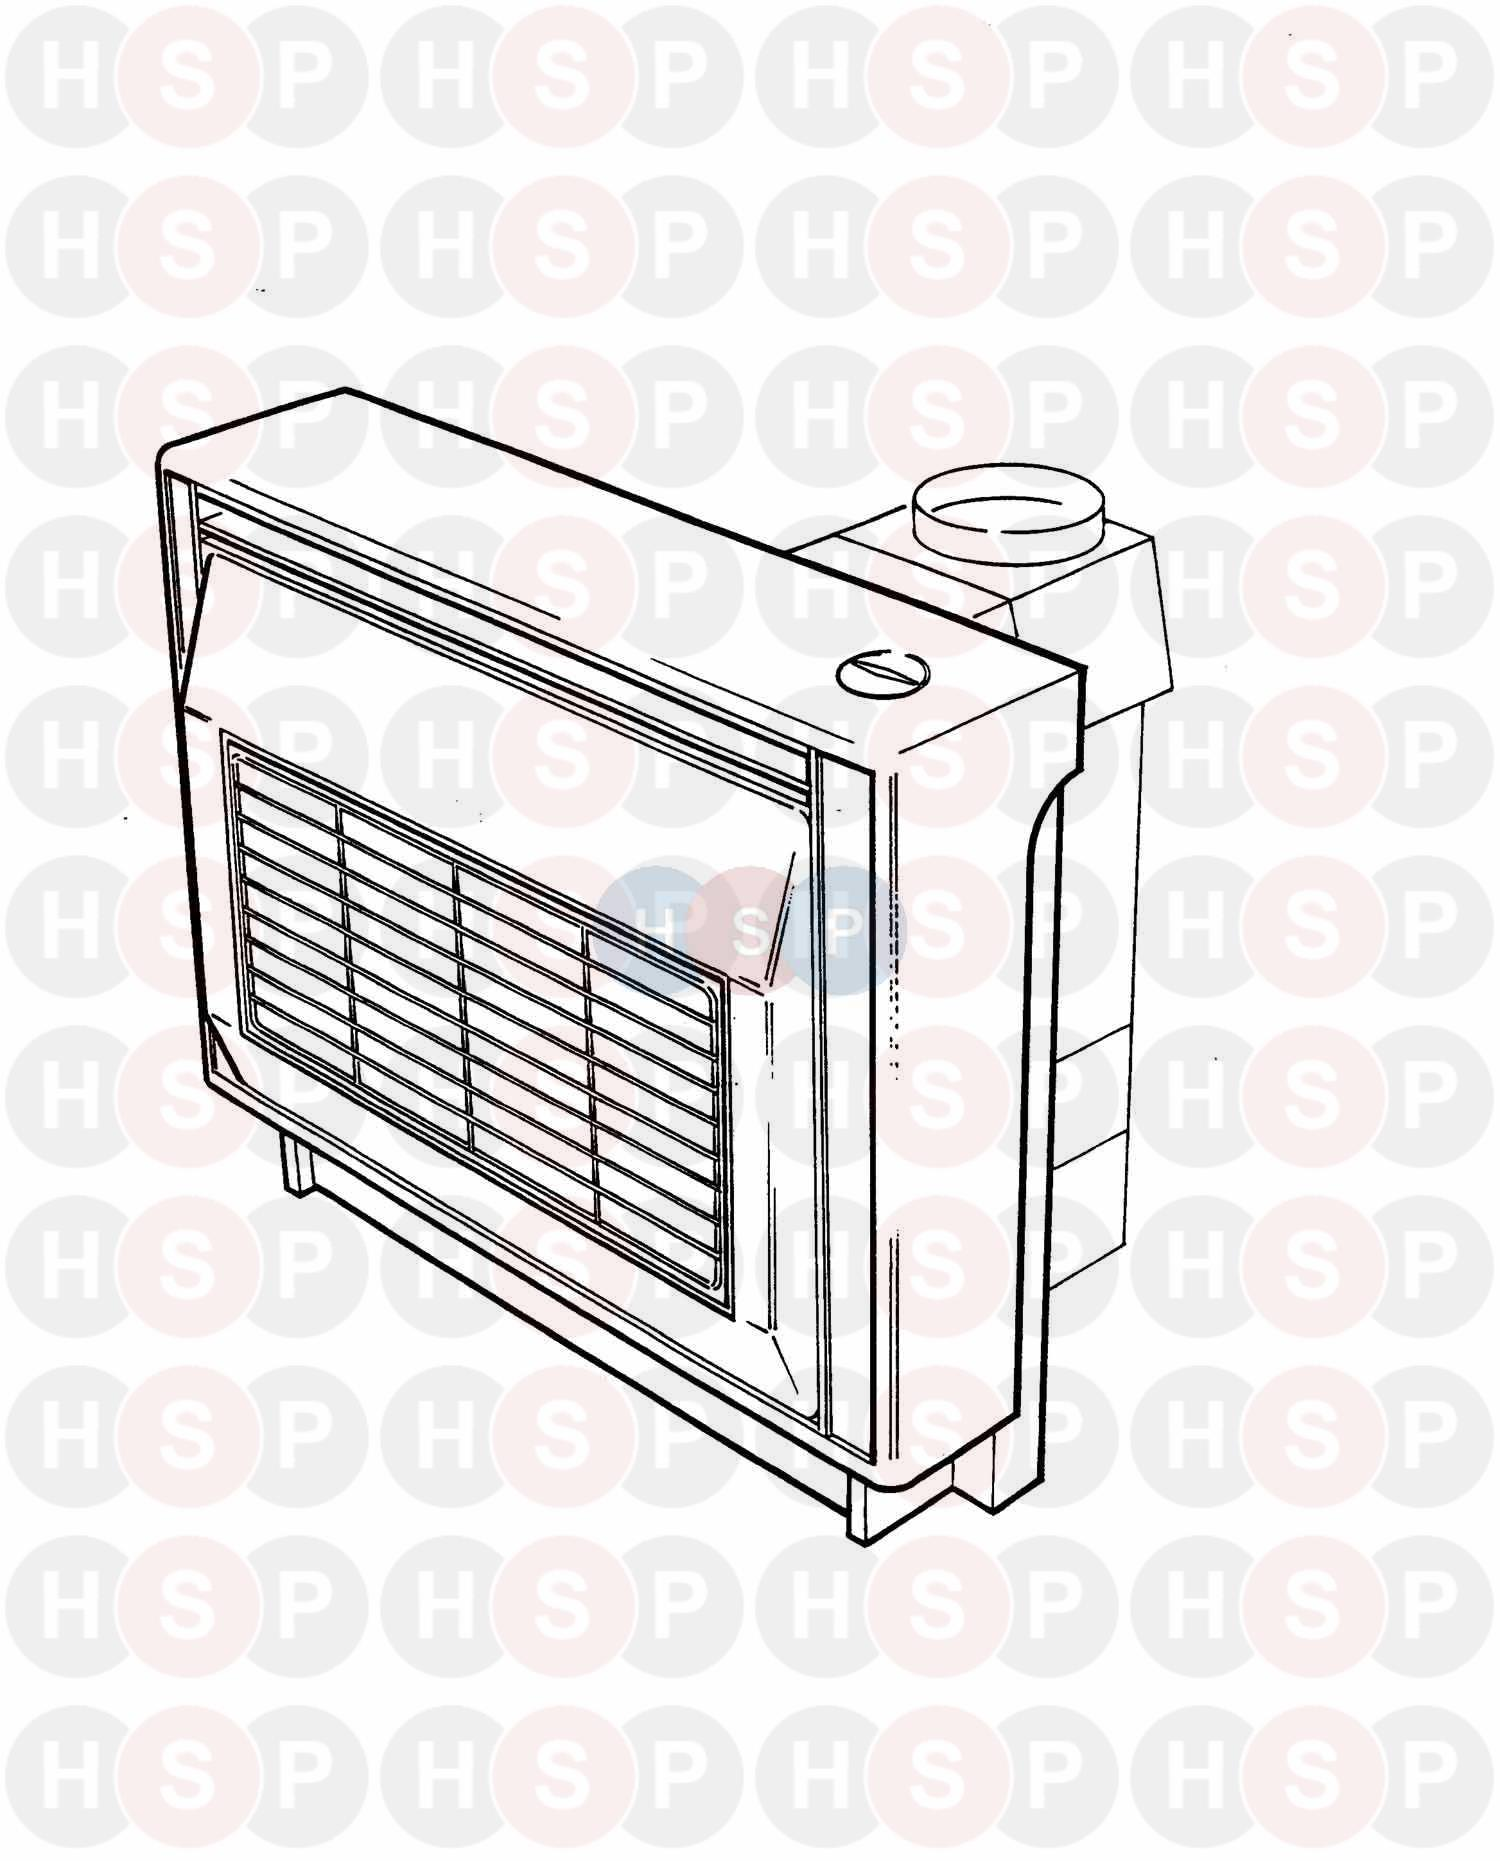 Potterton HOUSEWARMER (LATER) 55 ELECTRONIC & EPIC 2 976